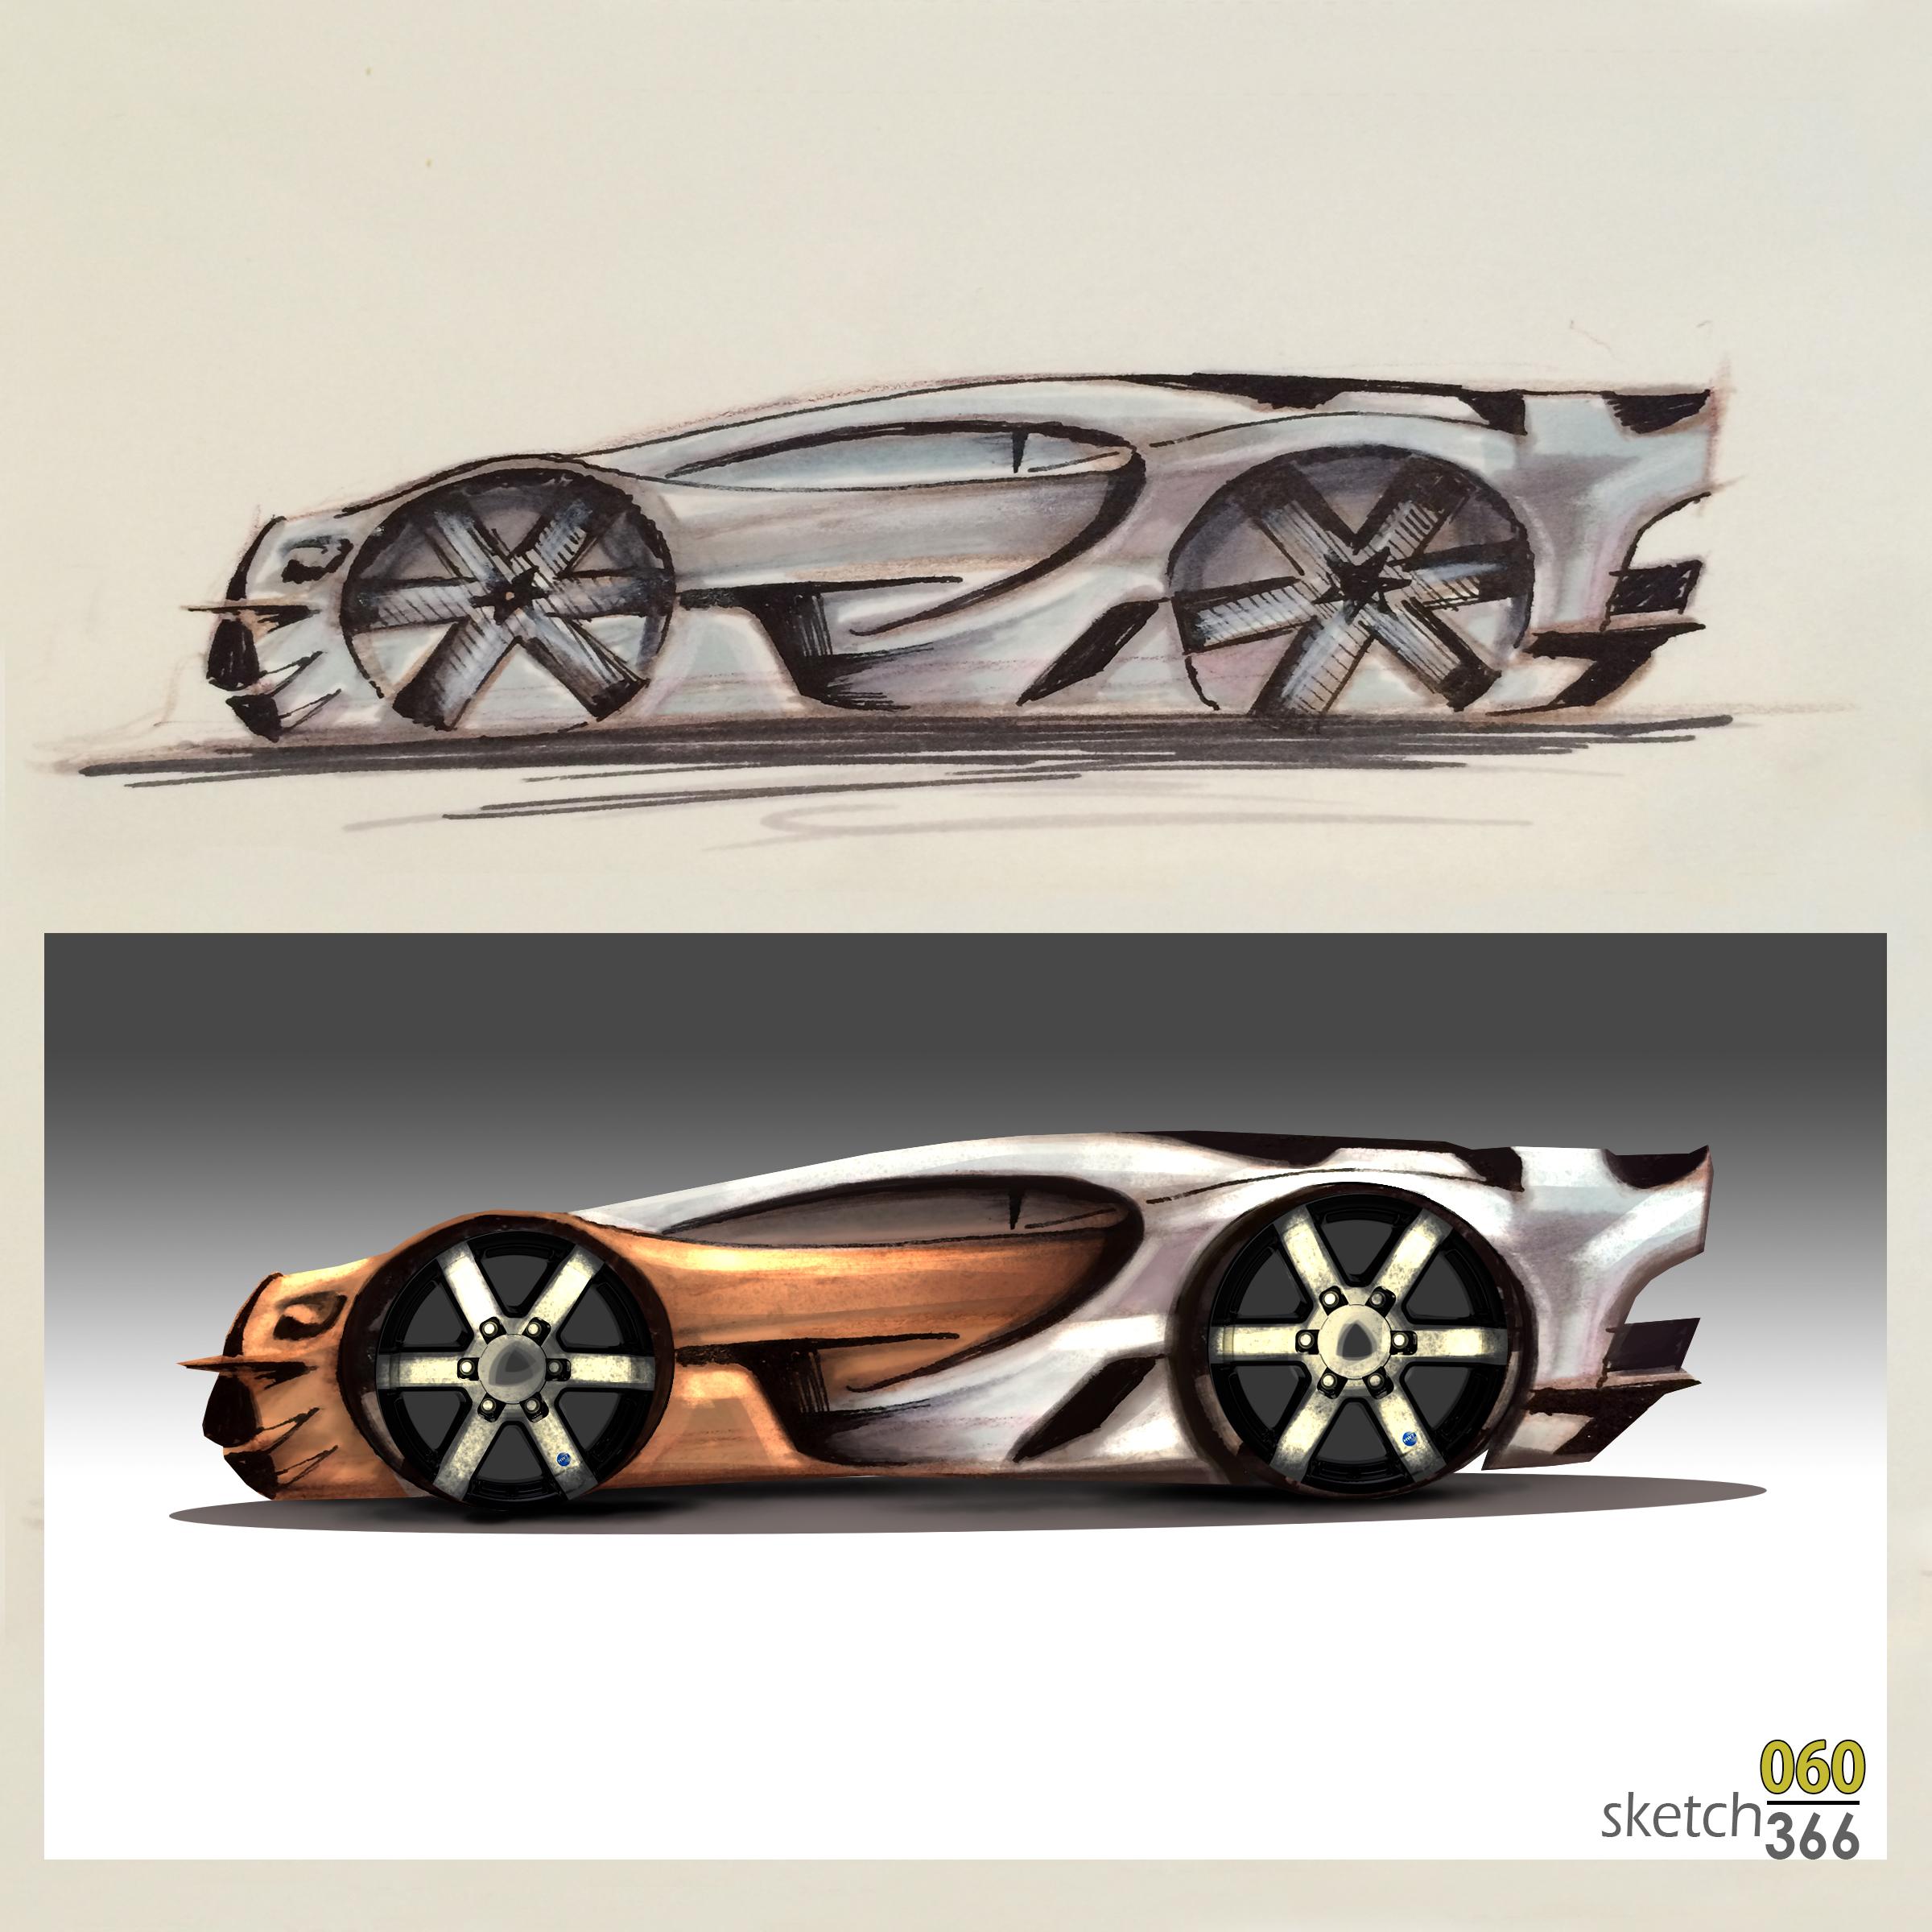 bugati concept sketch - pencil/marker/digital paint